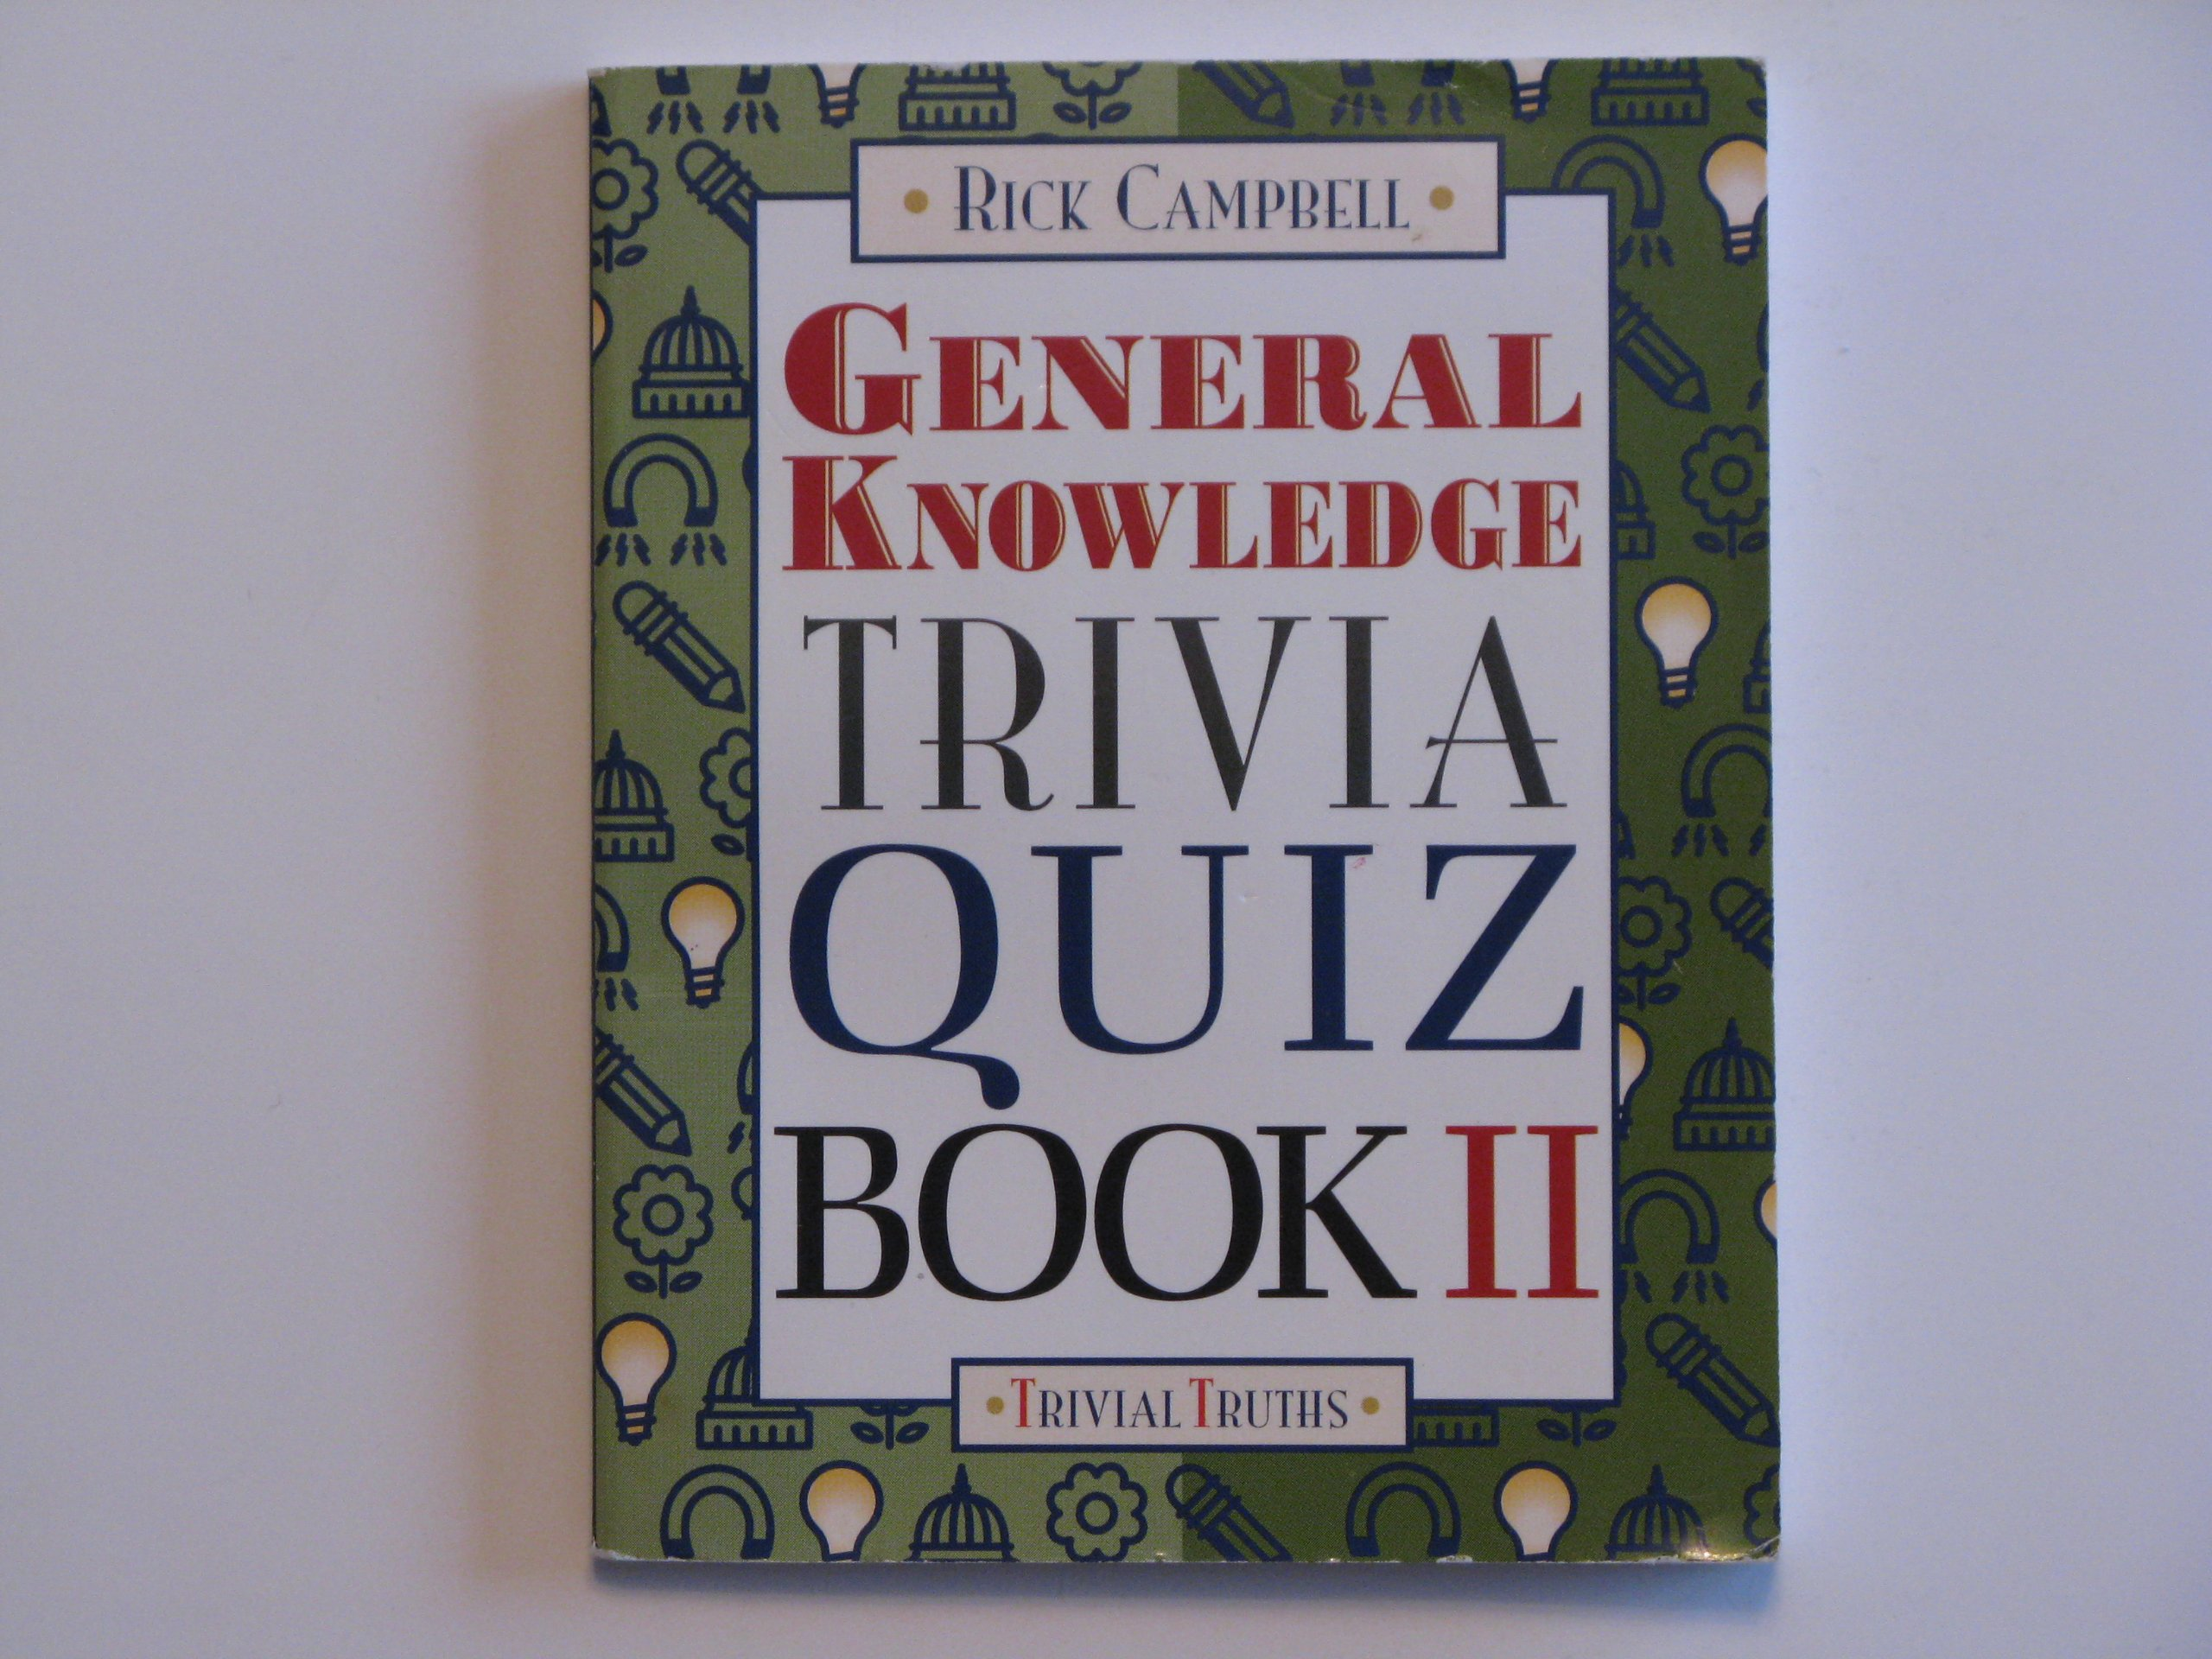 General Knowledge Trivia Quiz Book II: Rick Campbell: 9780760726679